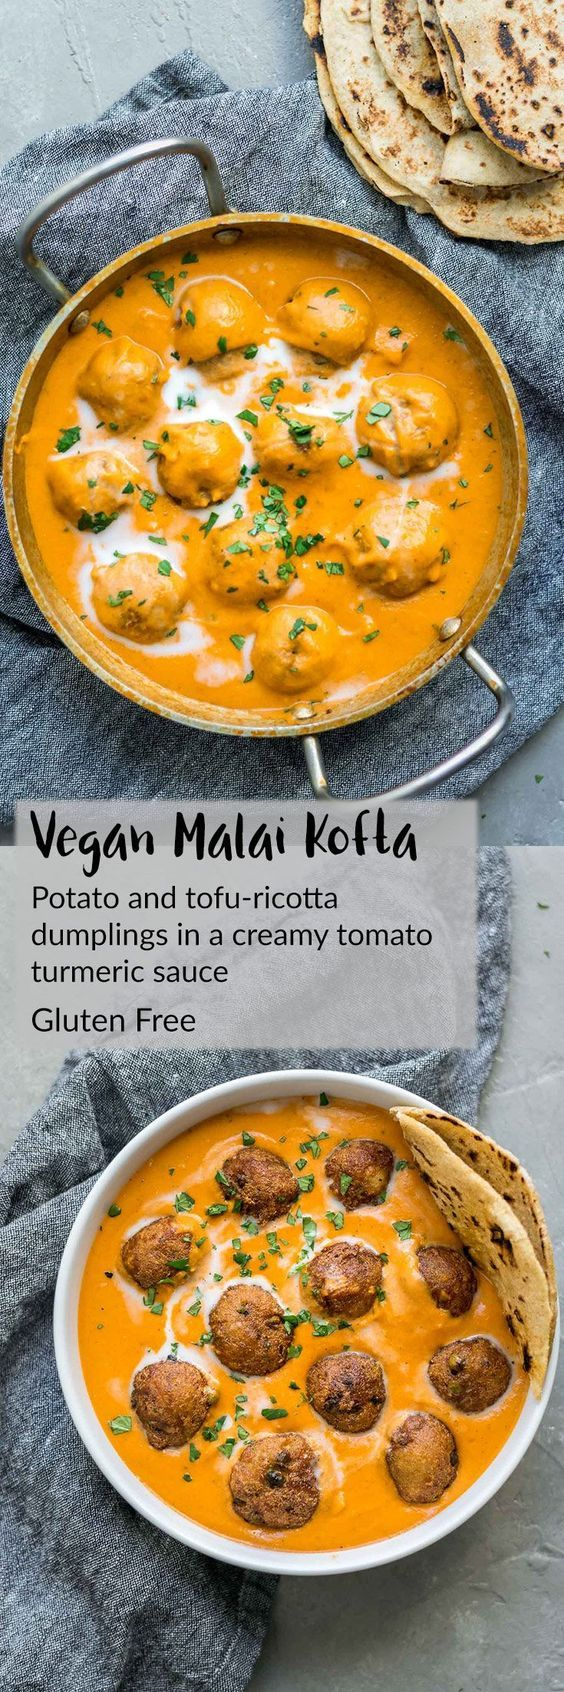 Vegan Malai Kofta: Indian dumplings in a curry tomato cream sauce   A vegan and naturally gluten free recipe. Enjoy with Indian flatbread or basmati rice.  thecuriouschickpea.com #vegan #veganrecipe #Indianfood #glutenfree